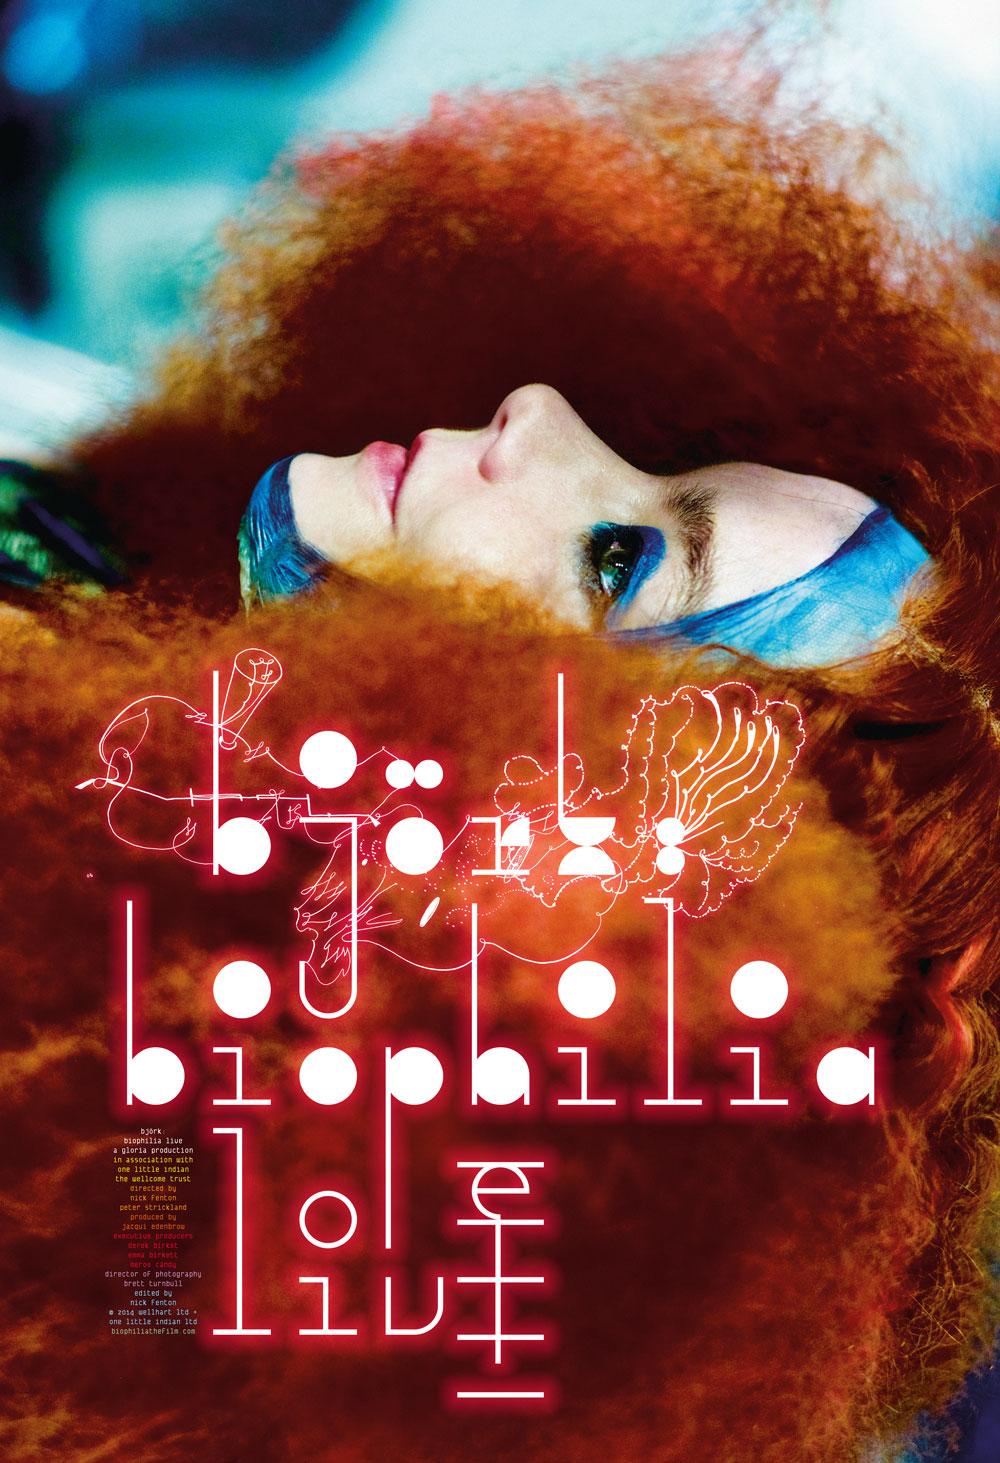 Björk (źródło: materiały prasowe organizatora)